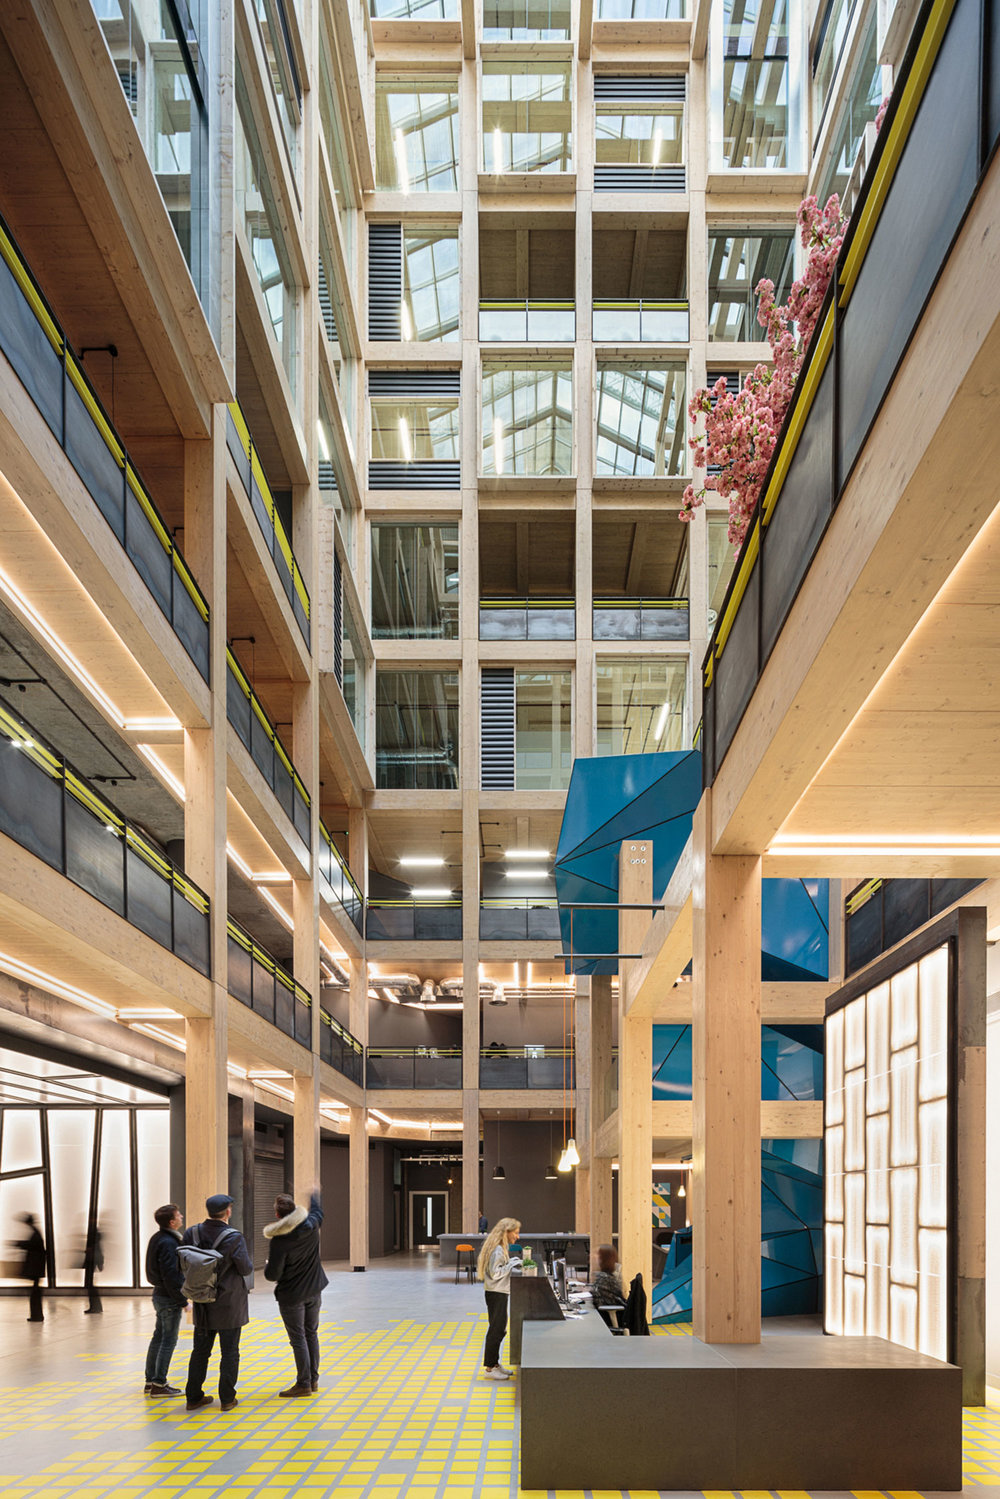 THE IMPORT BUILDING, REPUBLIC, LONDON